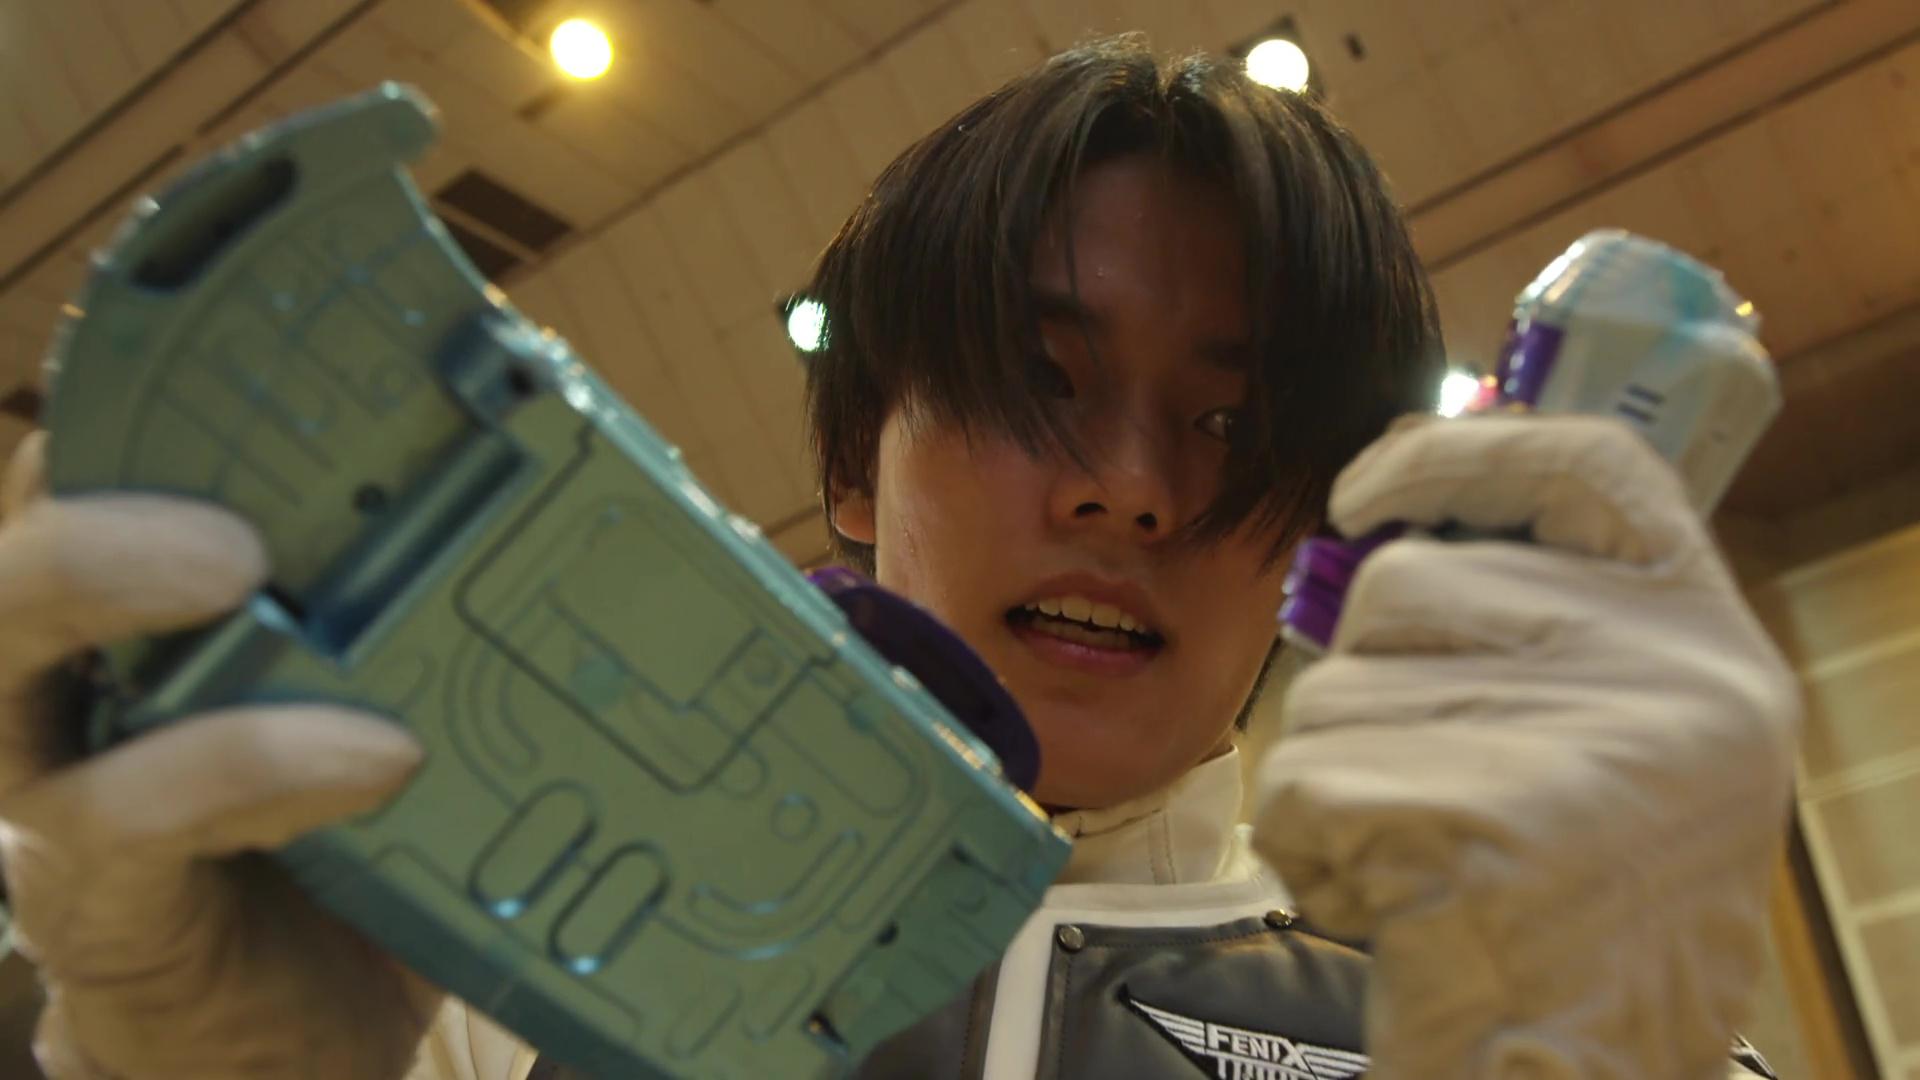 Kamen Rider Revice Episode 1 Recap